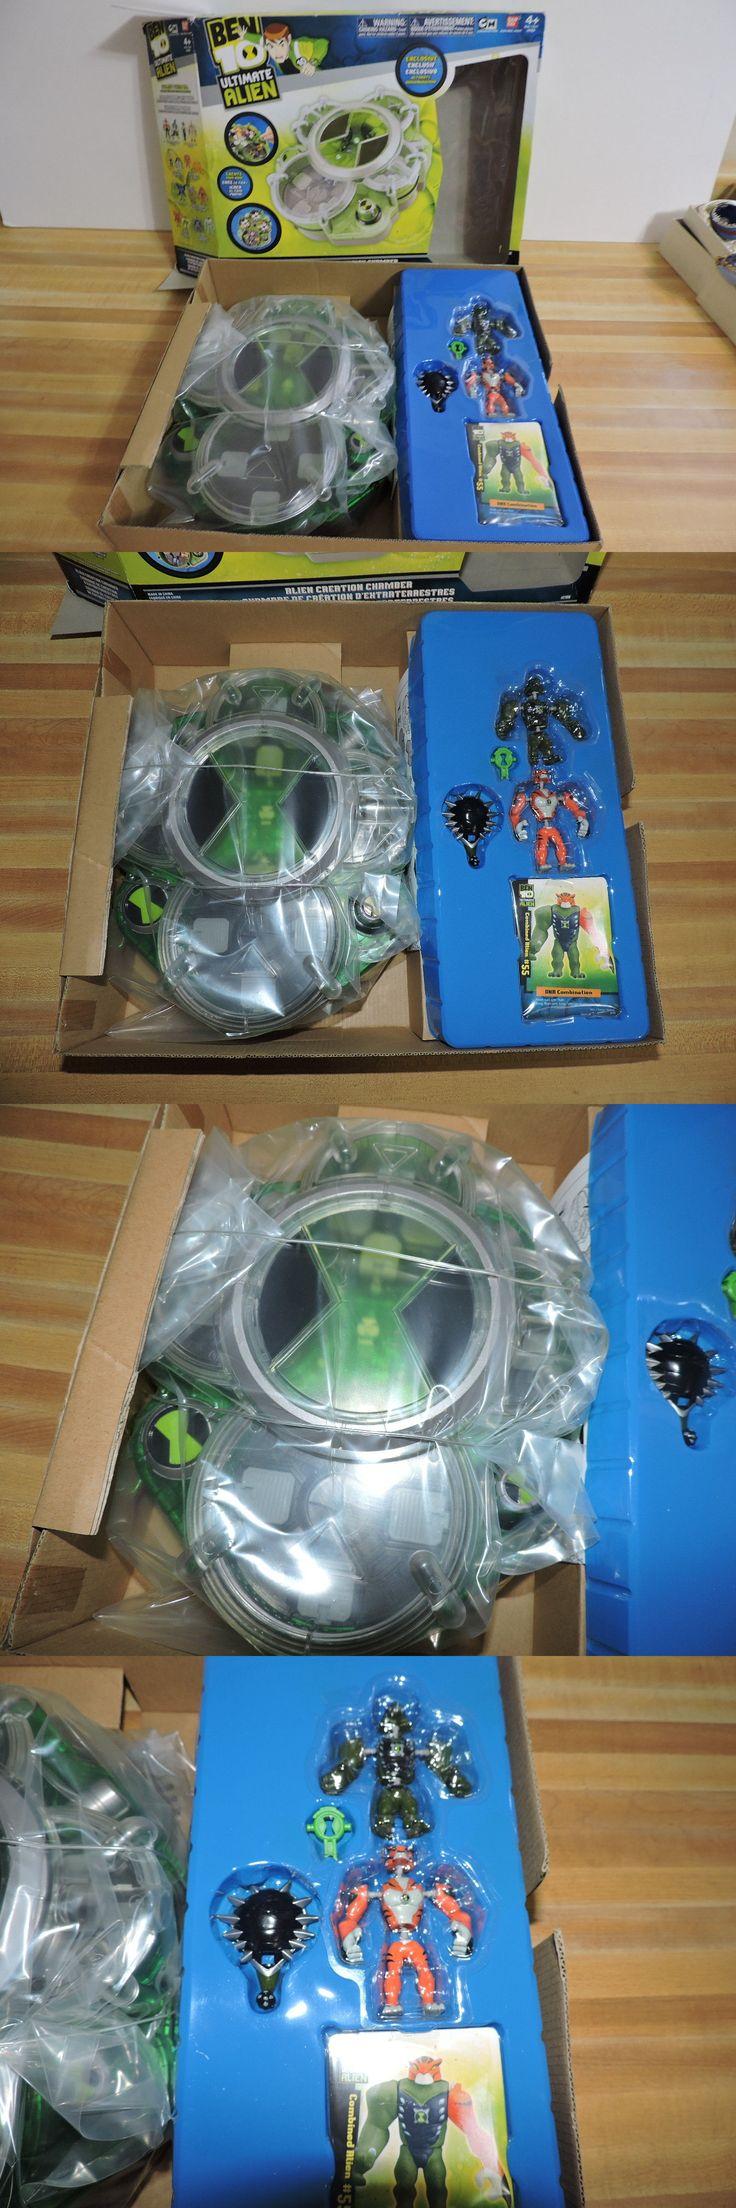 Ben 10 152906: Ben 10 Ultimate Alien Creation Chamber Nib 2010 Bandai -> BUY IT NOW ONLY: $32.99 on eBay!